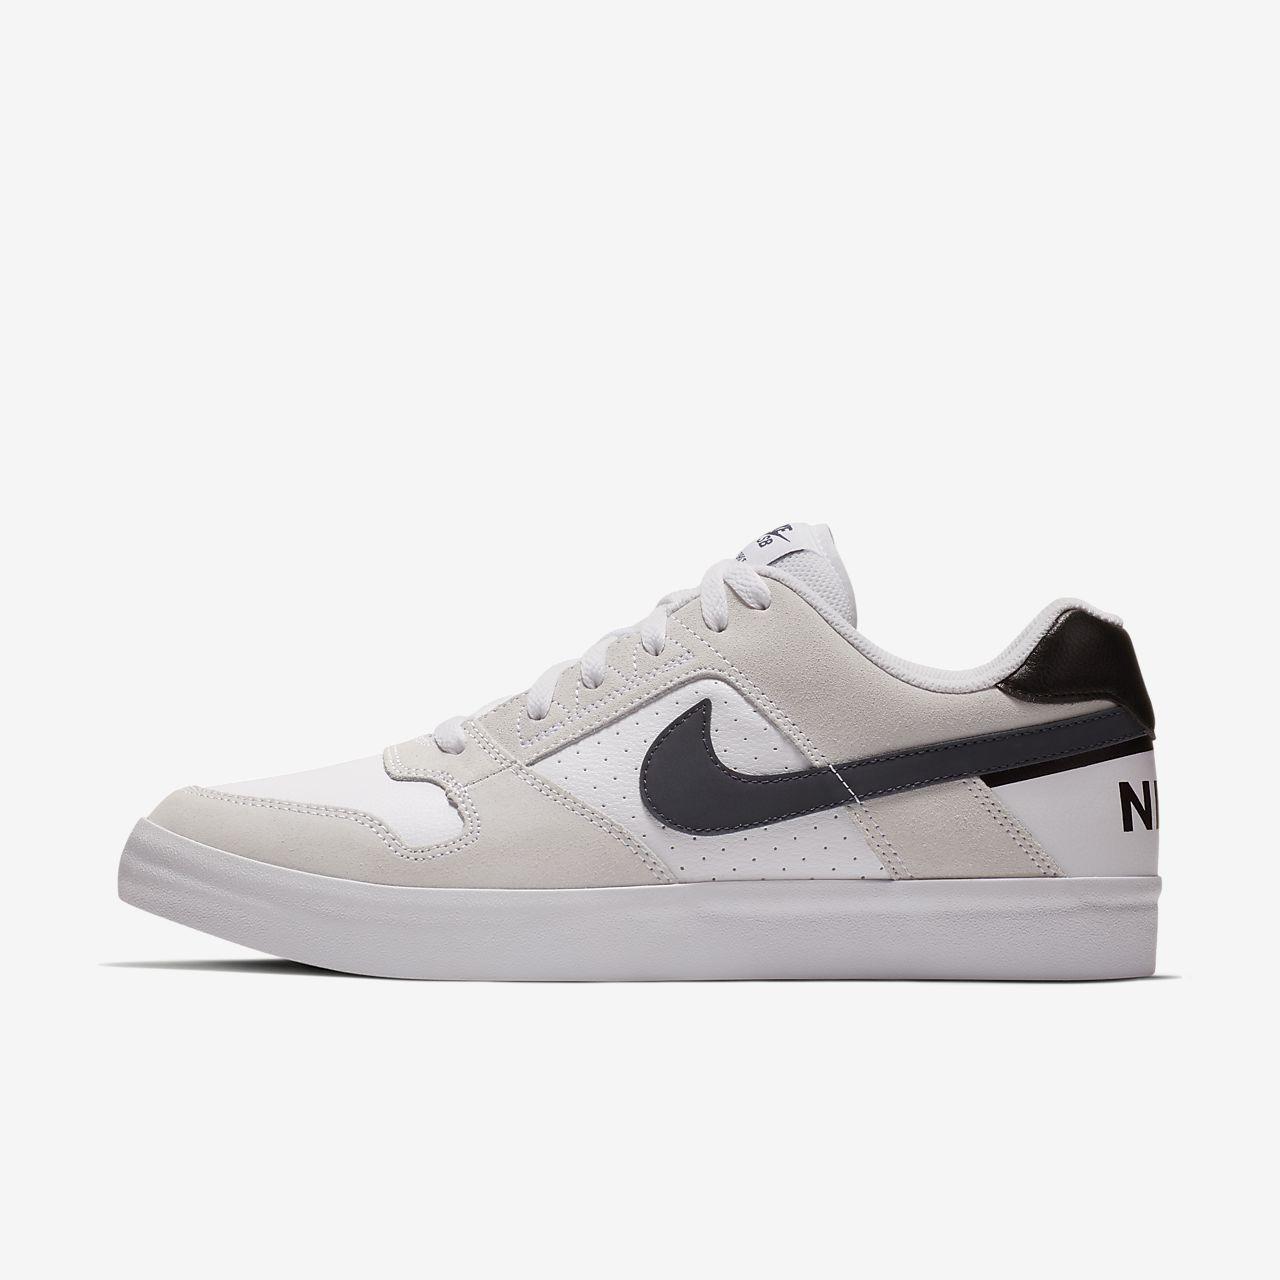 Mens Black Suede Nke Sb Shoes Size